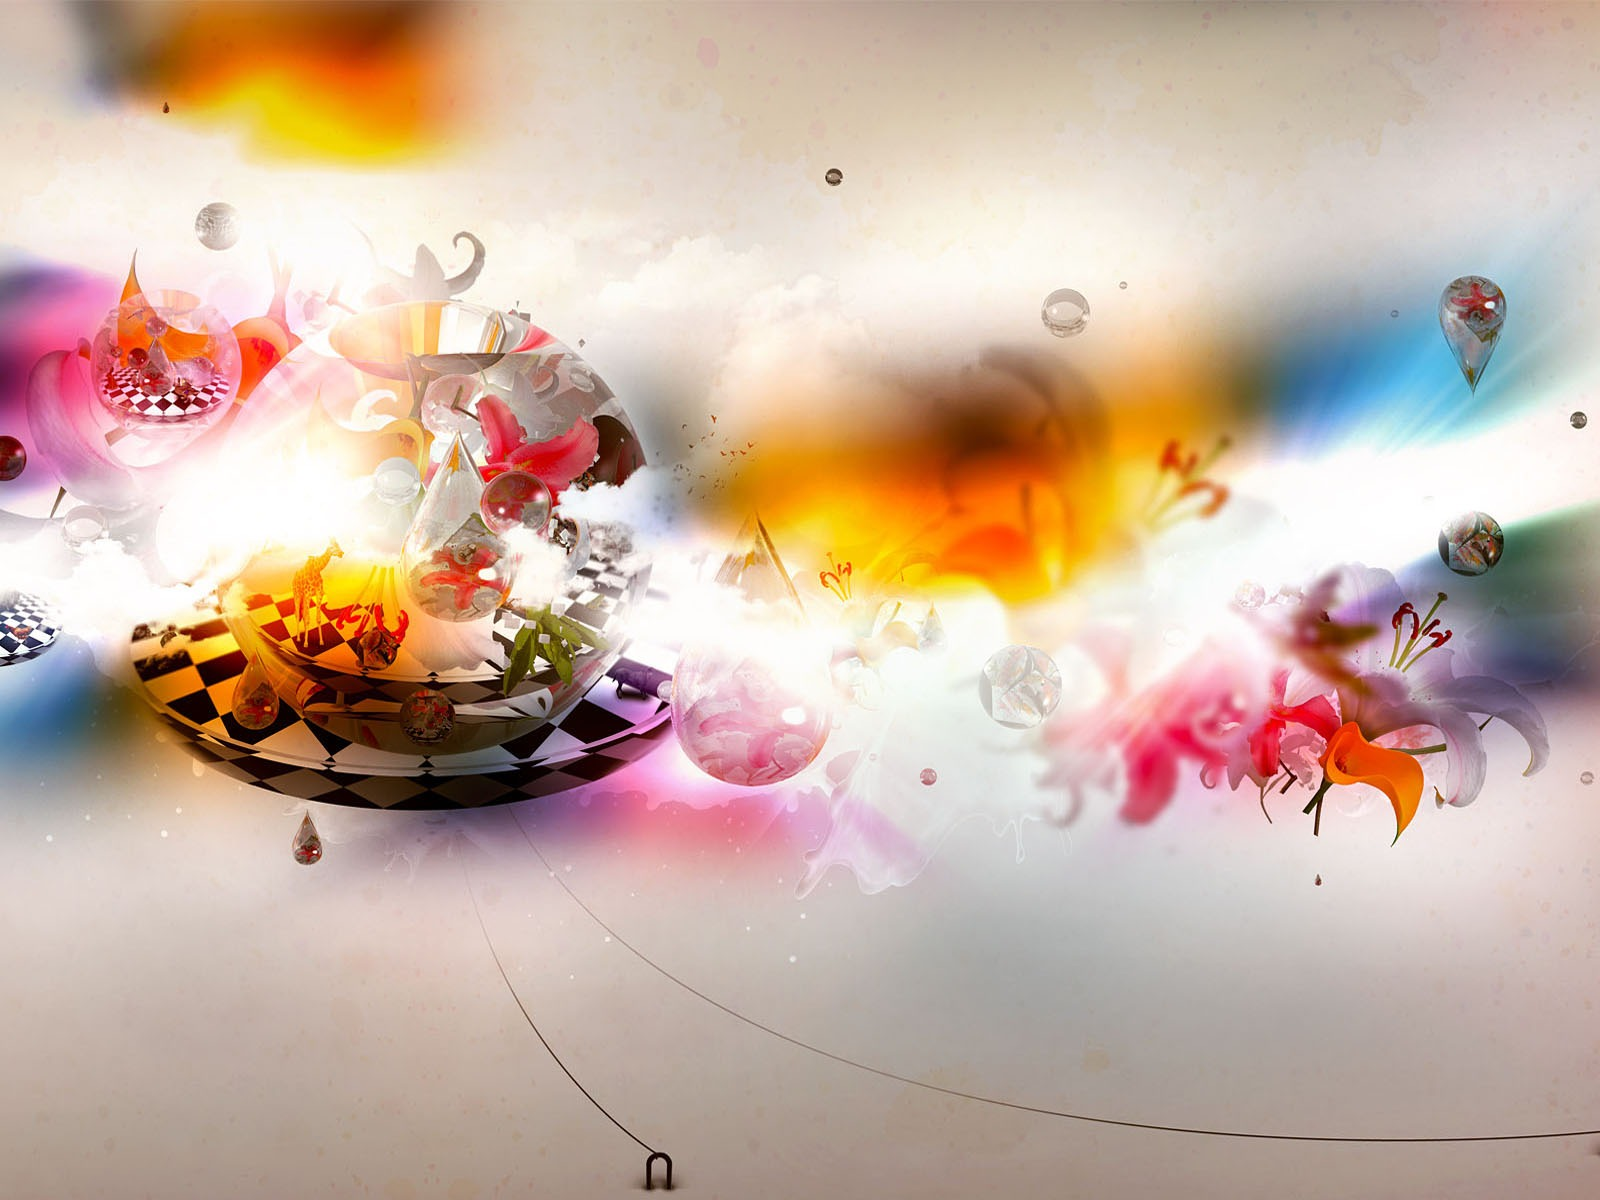 19 creative wallpaper design - photo #5